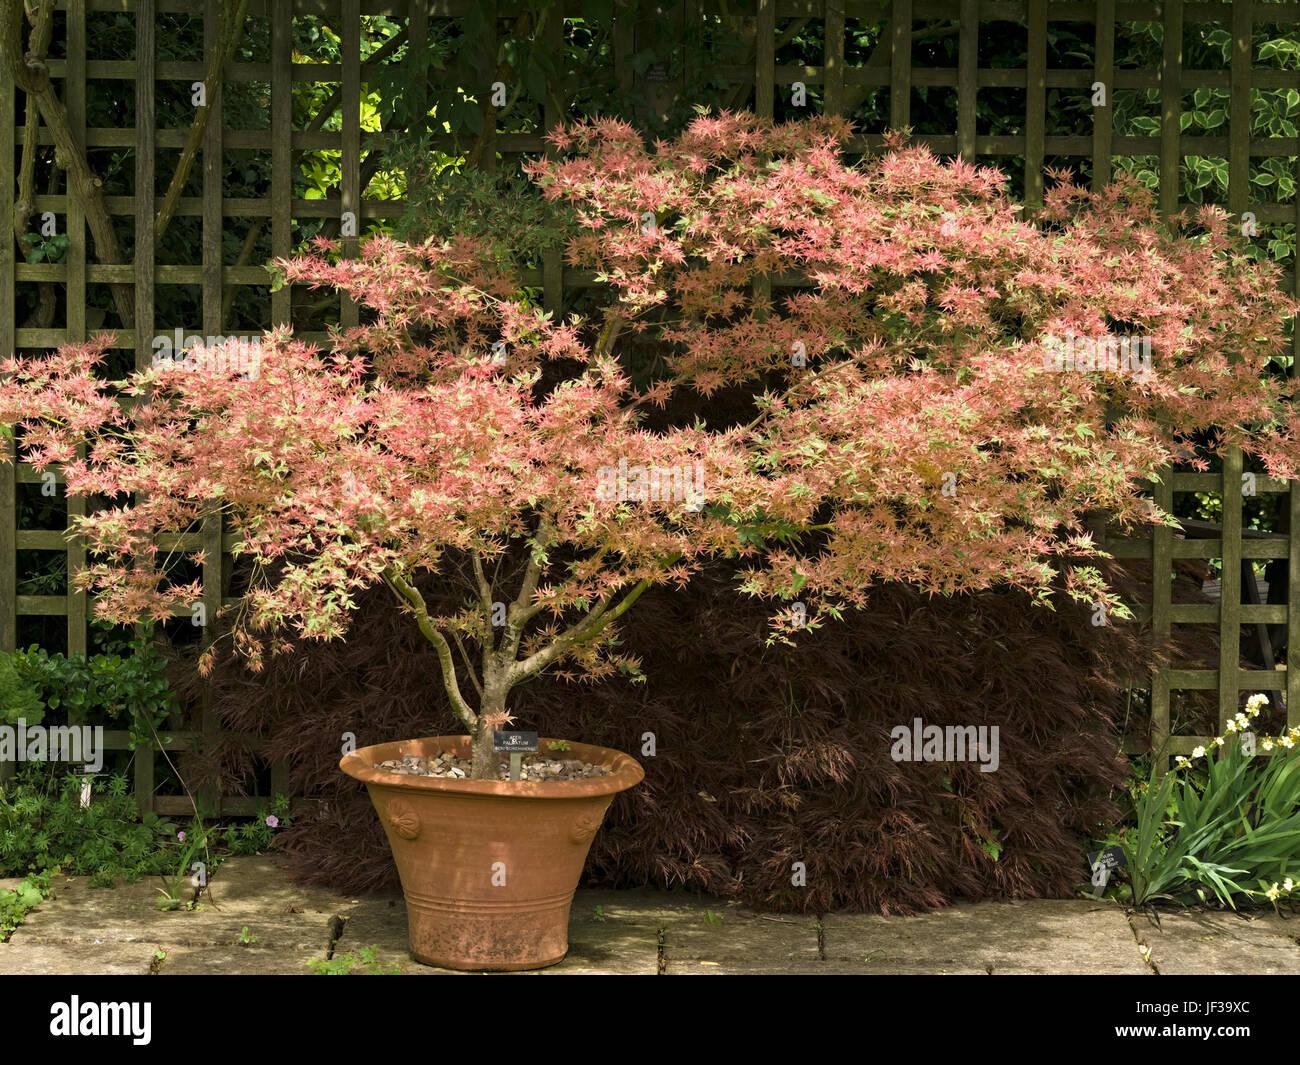 Japanese Maple Acer Palmatum Beni Schichihenge In Terracotta Patio